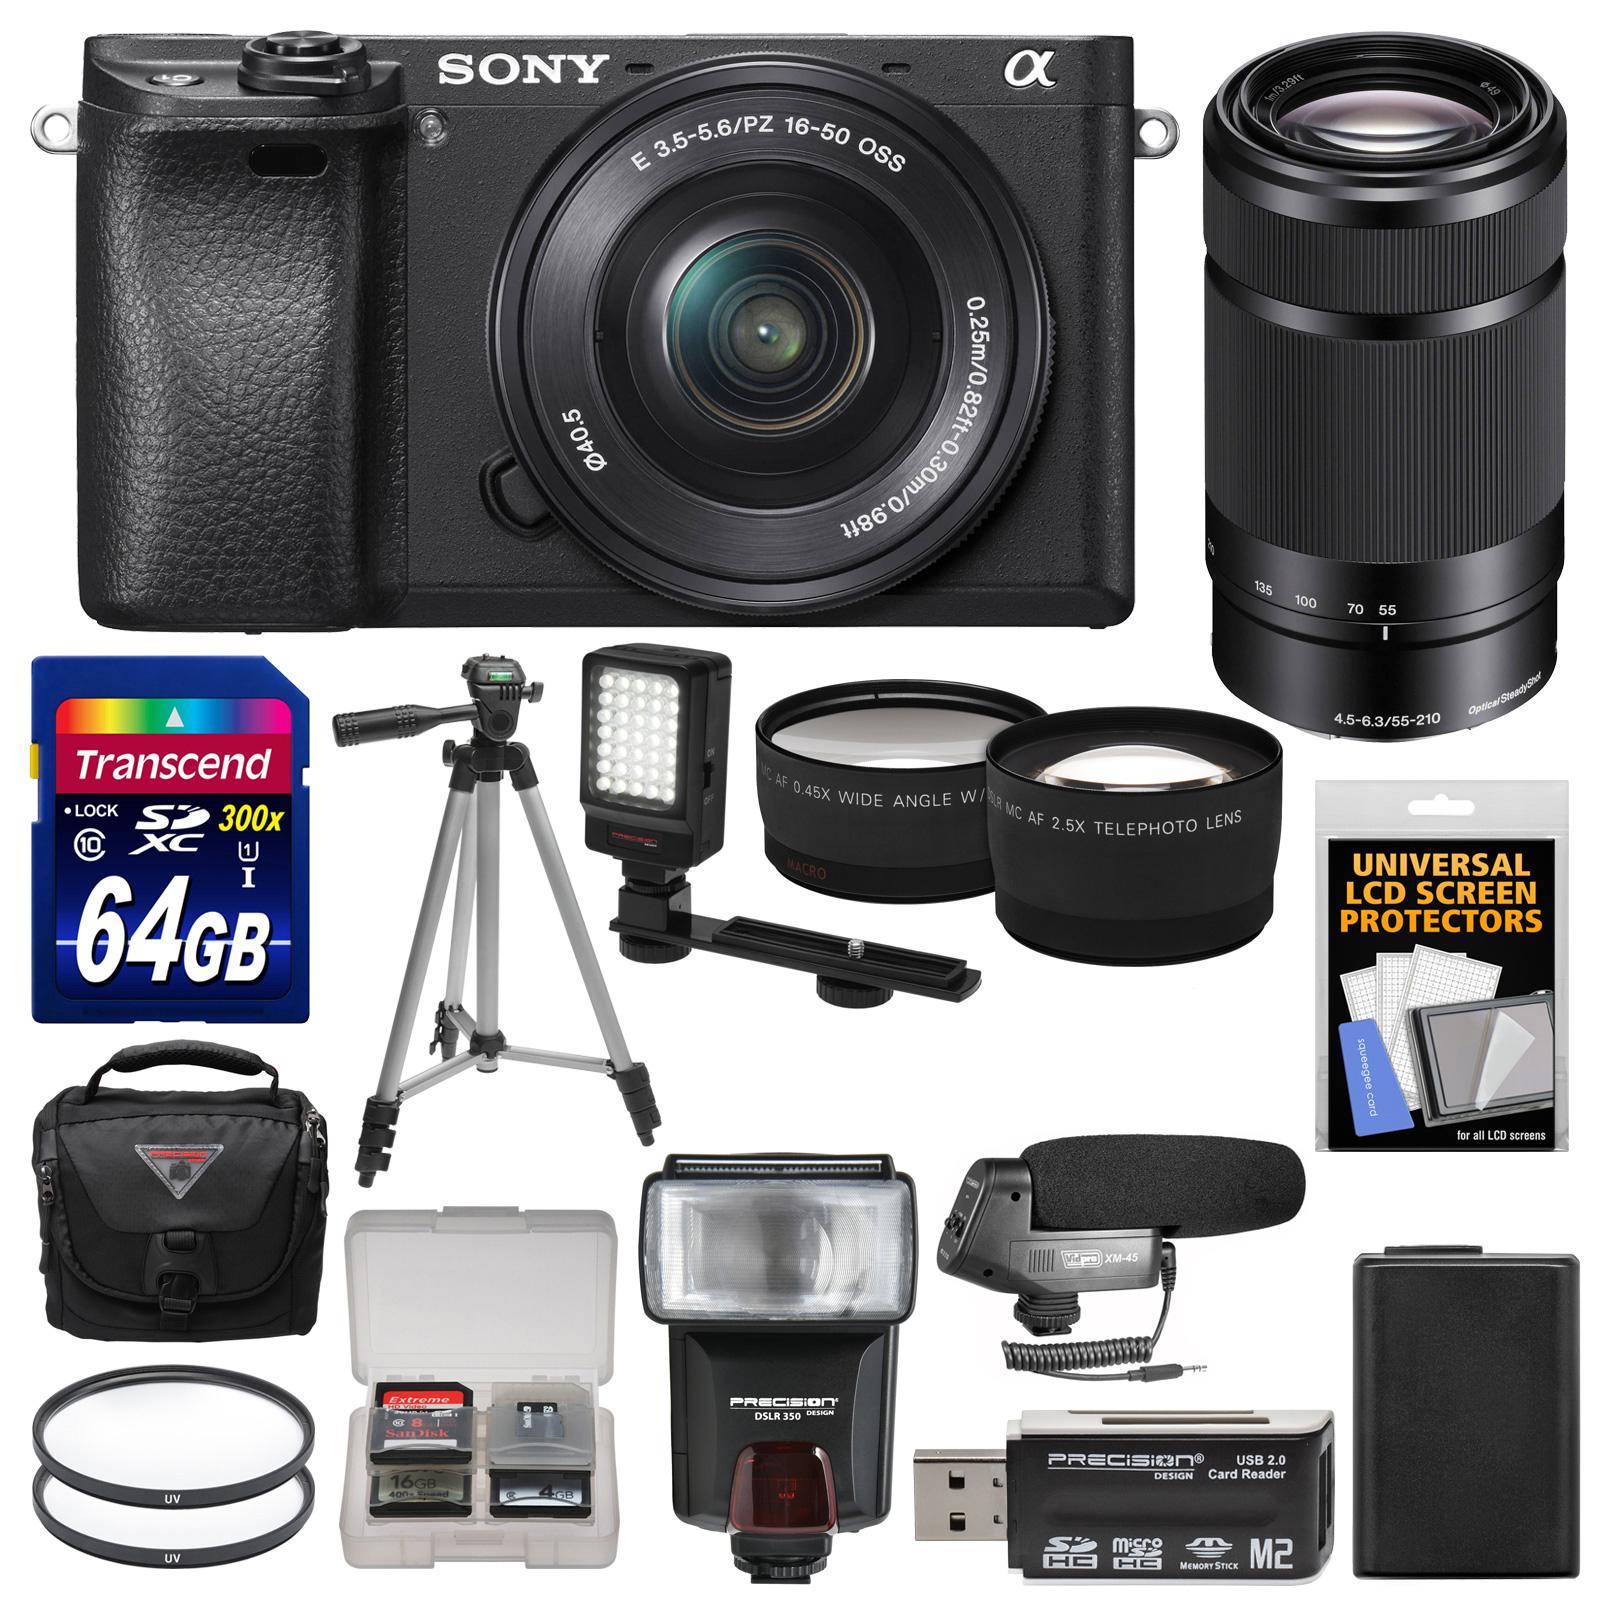 Sony Alpha A6300 4K Wi-Fi Digital Camera & 16-50mm & 55-210mm Lenses (Black) with 64GB Card + Case + Flash + Video Light + Mic + Battery + Tripod + Kit